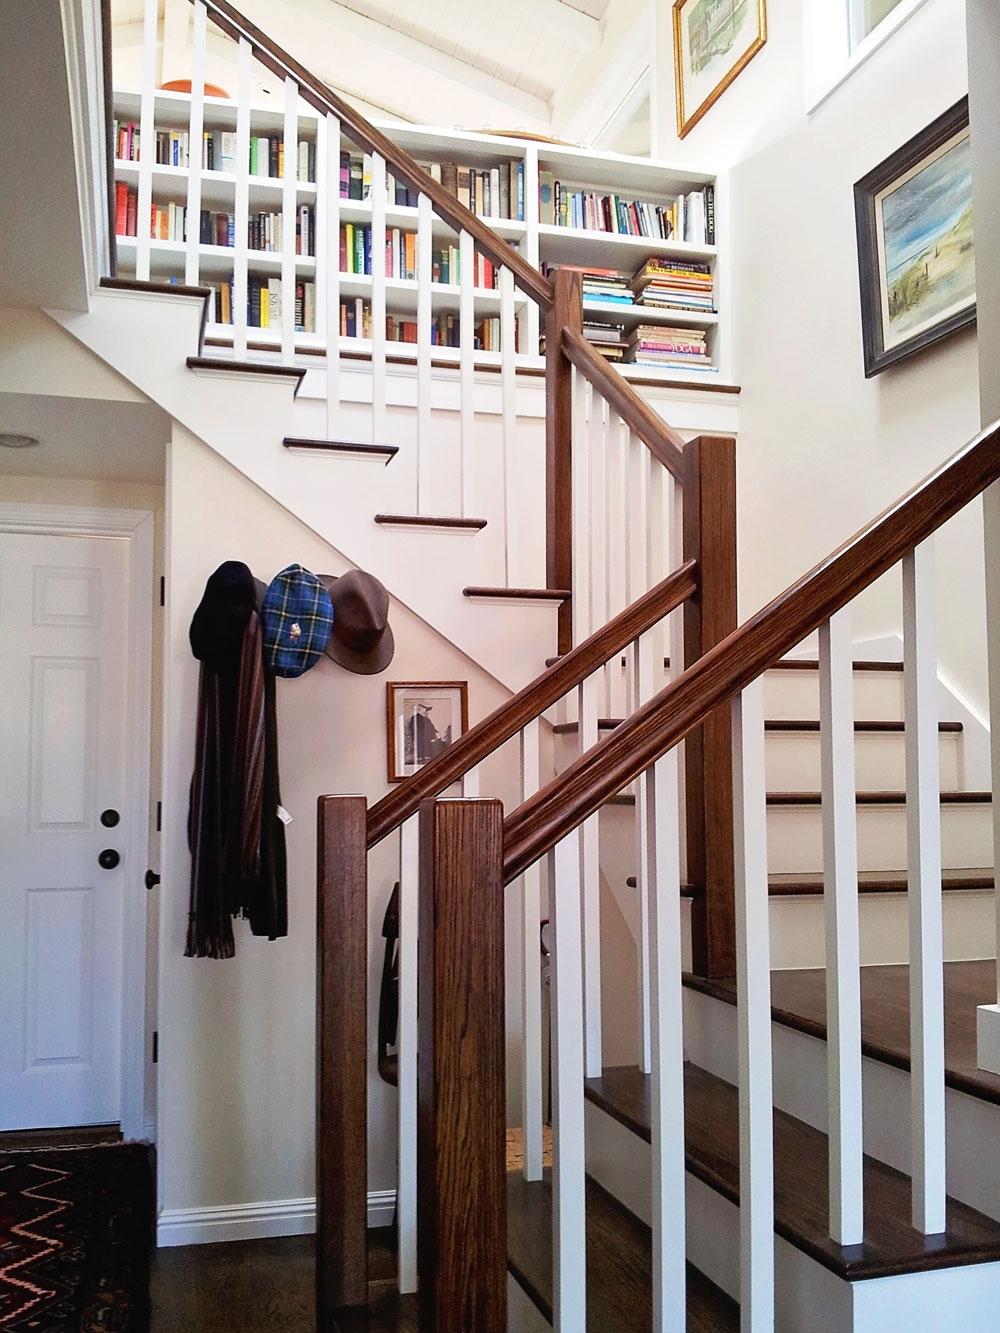 5-staircase-landing-banister-bookshelf-dee-carawan.jpg